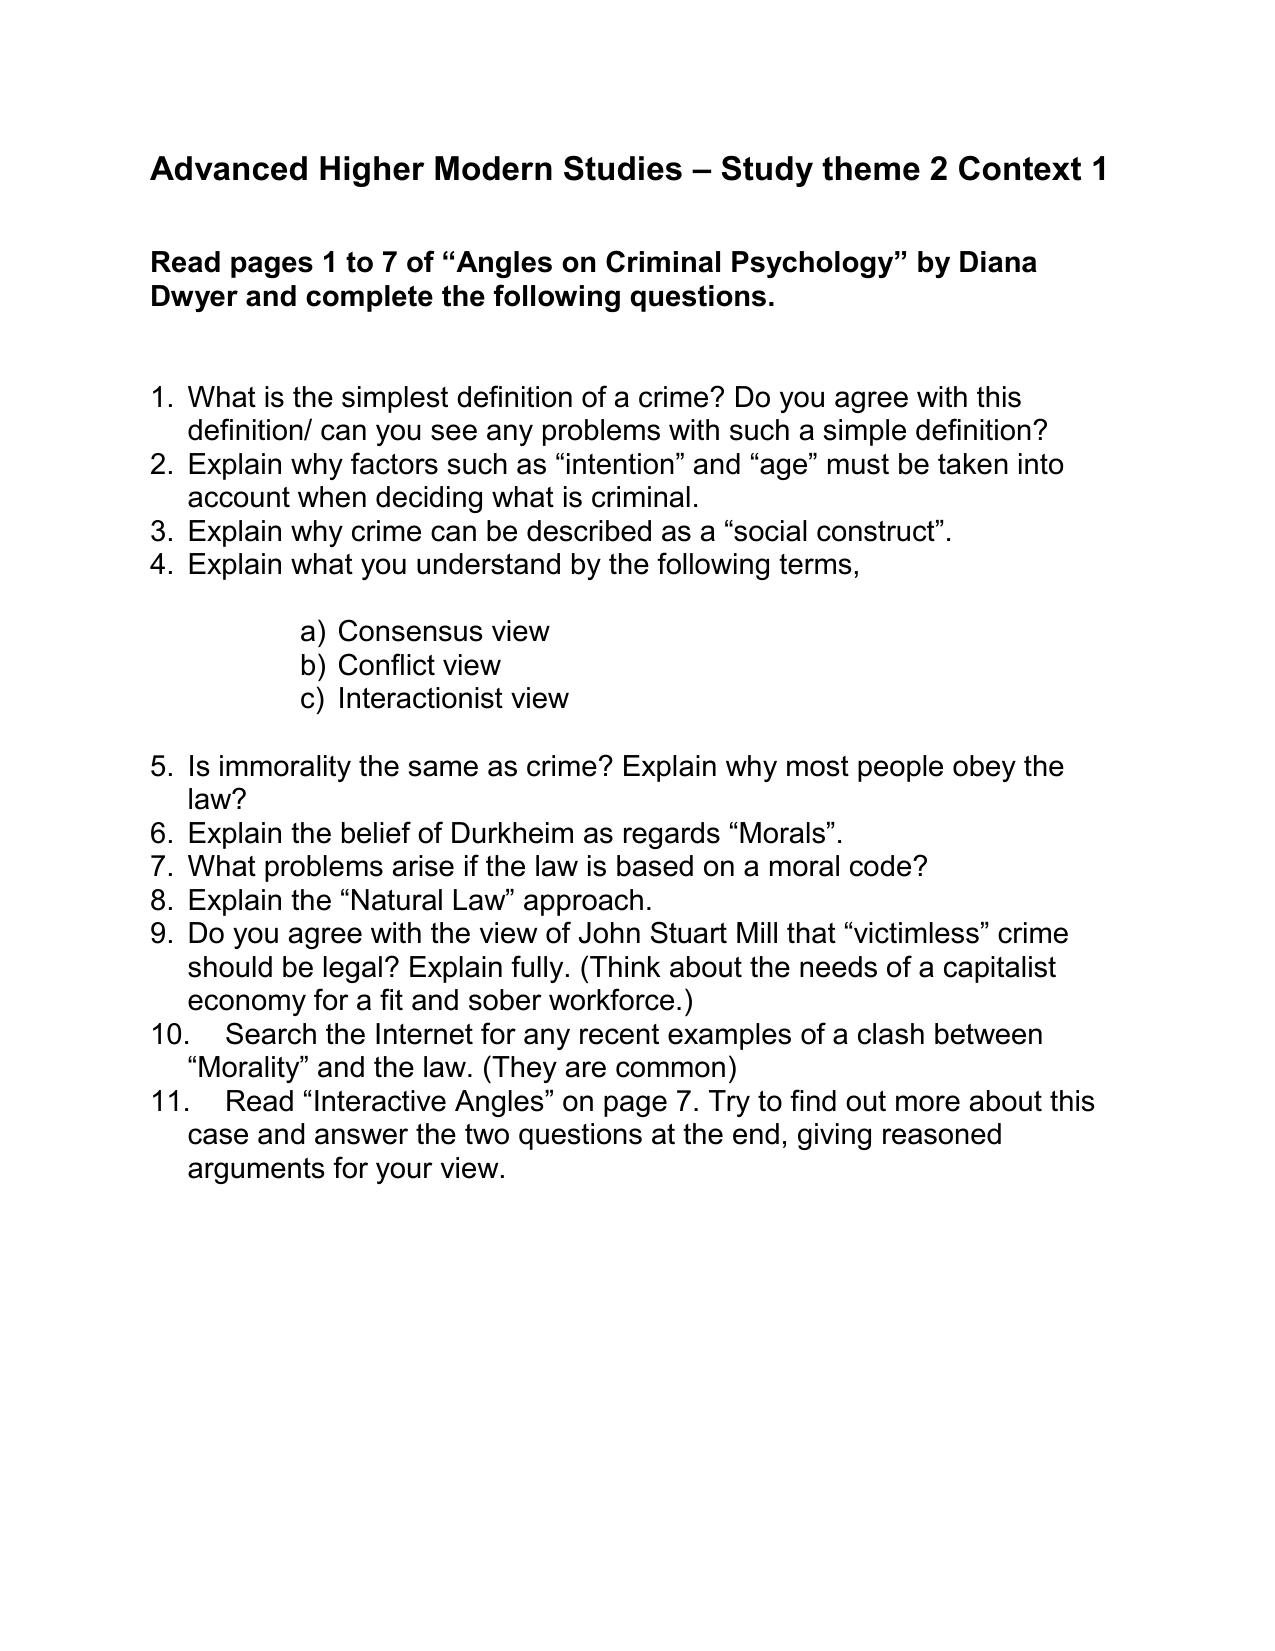 criminal psychology questions